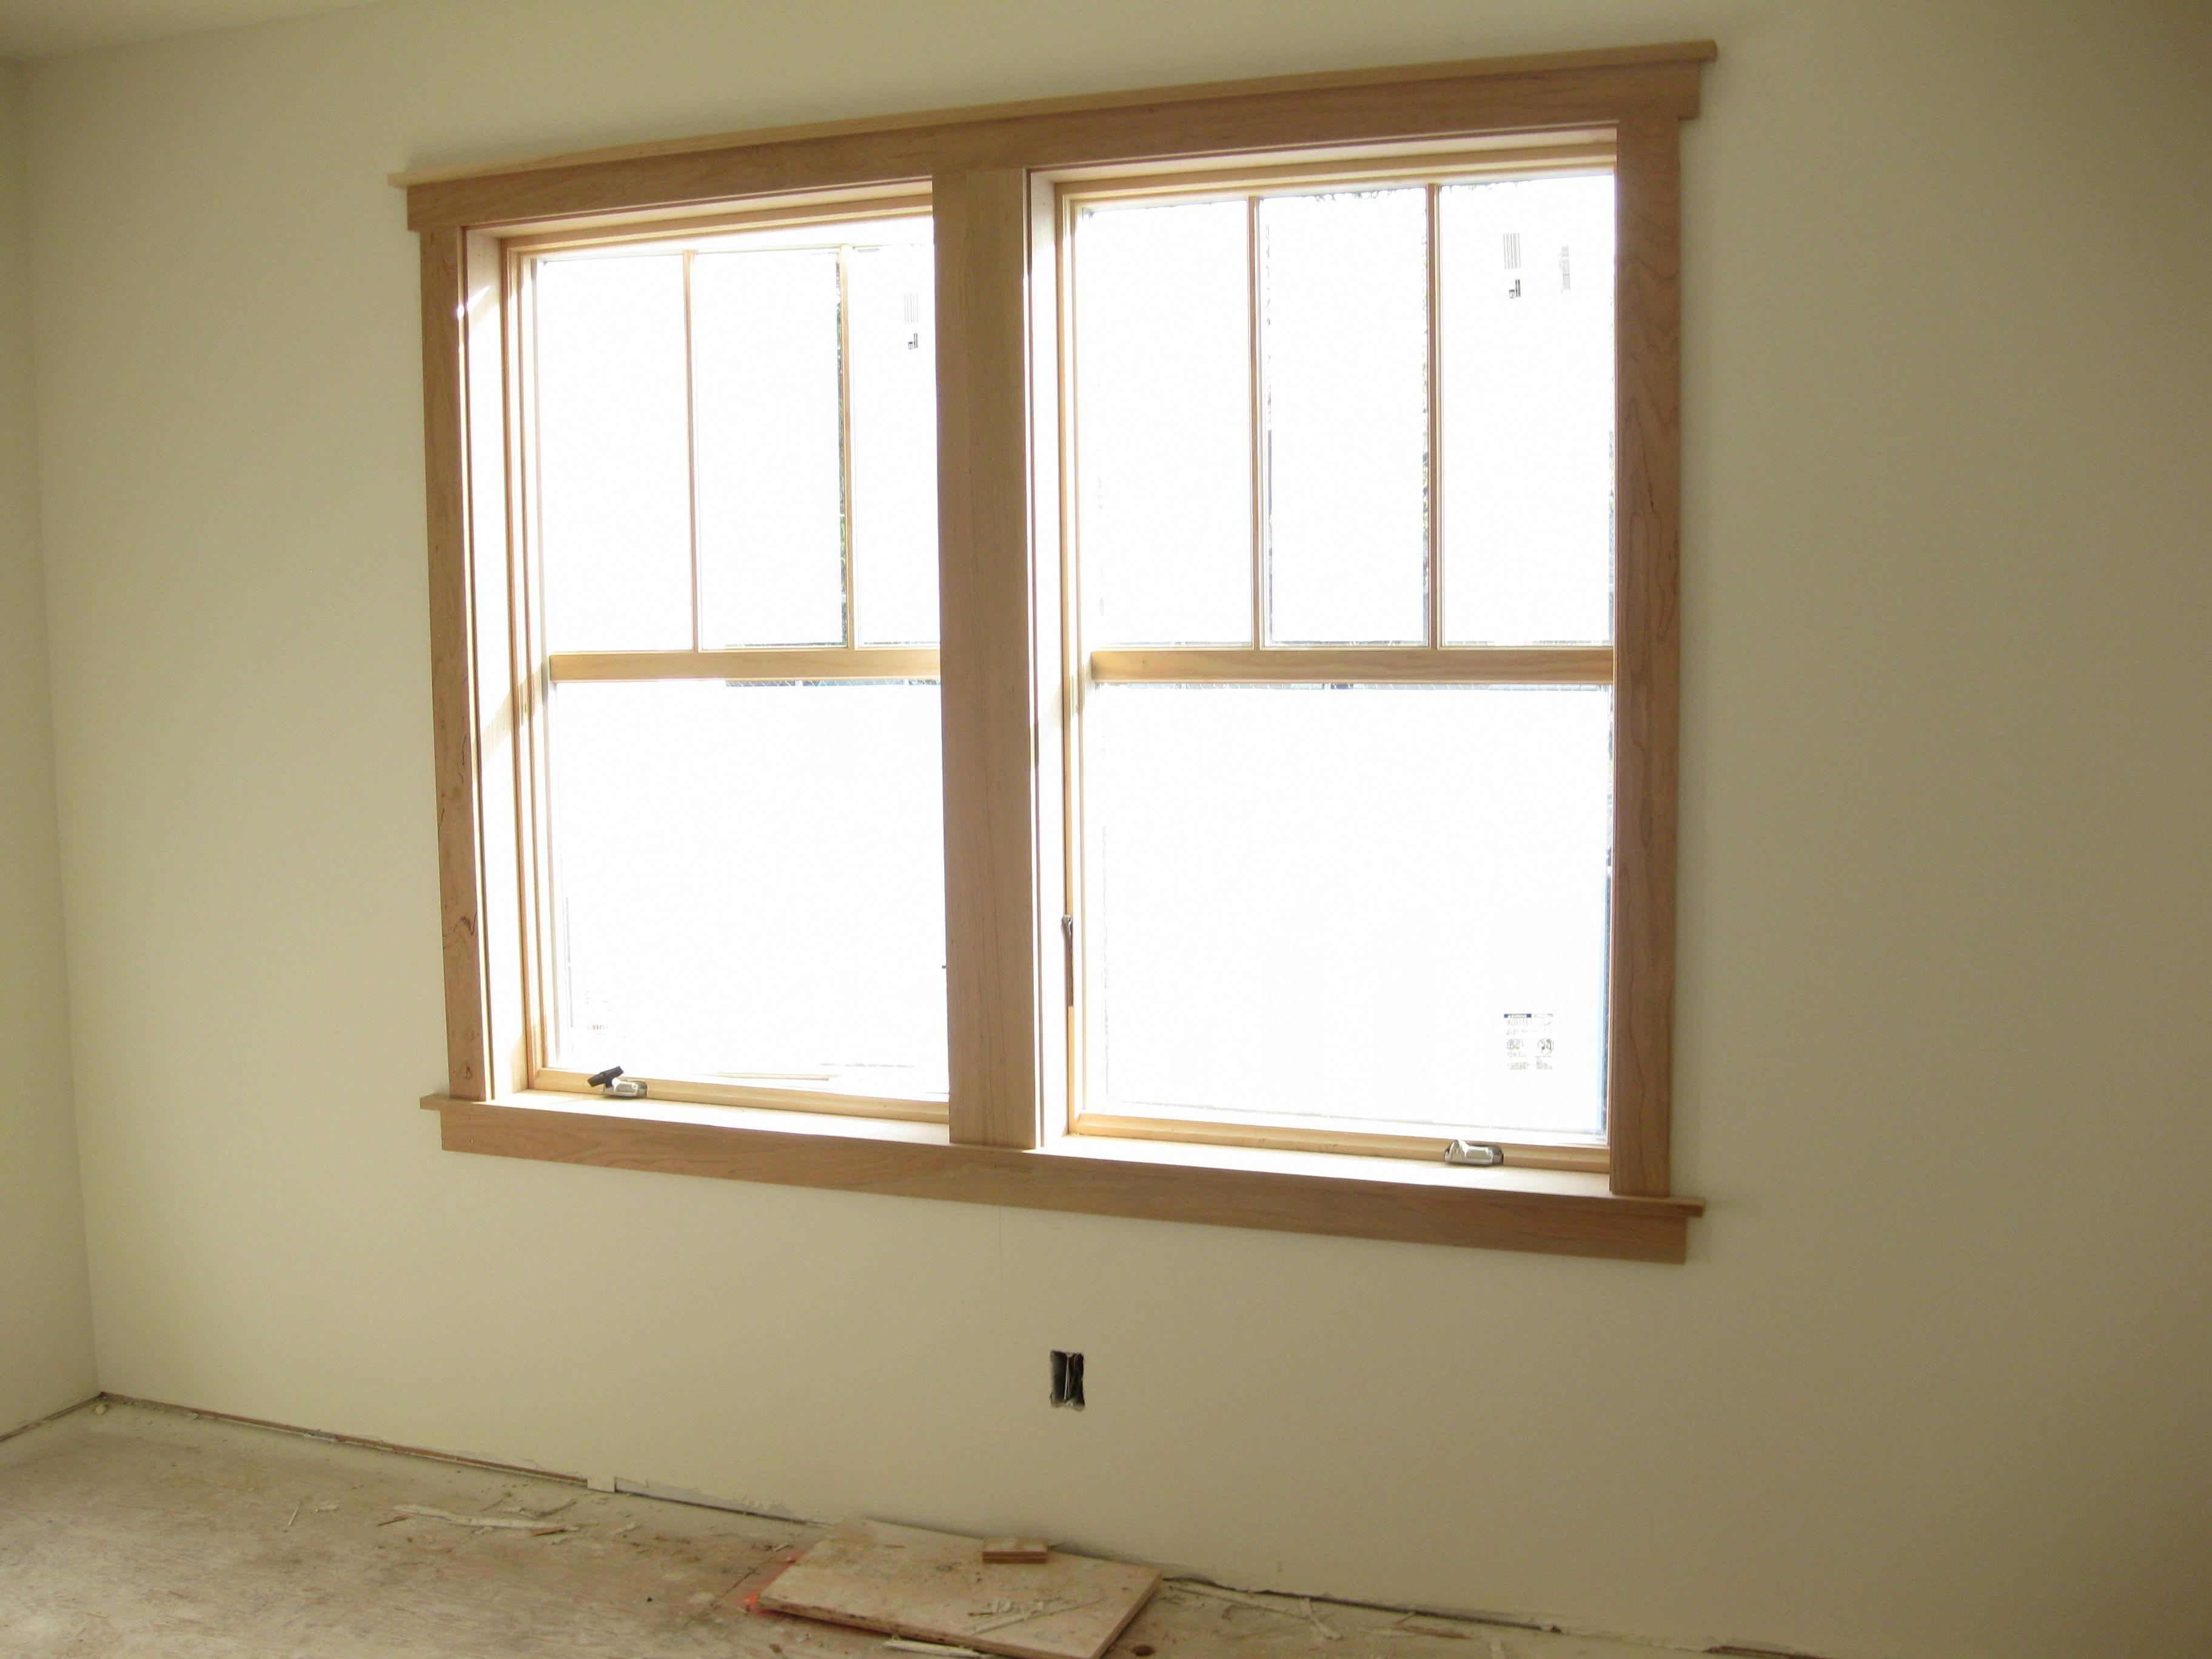 Window Trim Ideas Tags Interior Exterior Farmhouse Painting Diy Ideas Craftsman Simple Molding Wood Doors Interior Window Trim Interior Window Trim